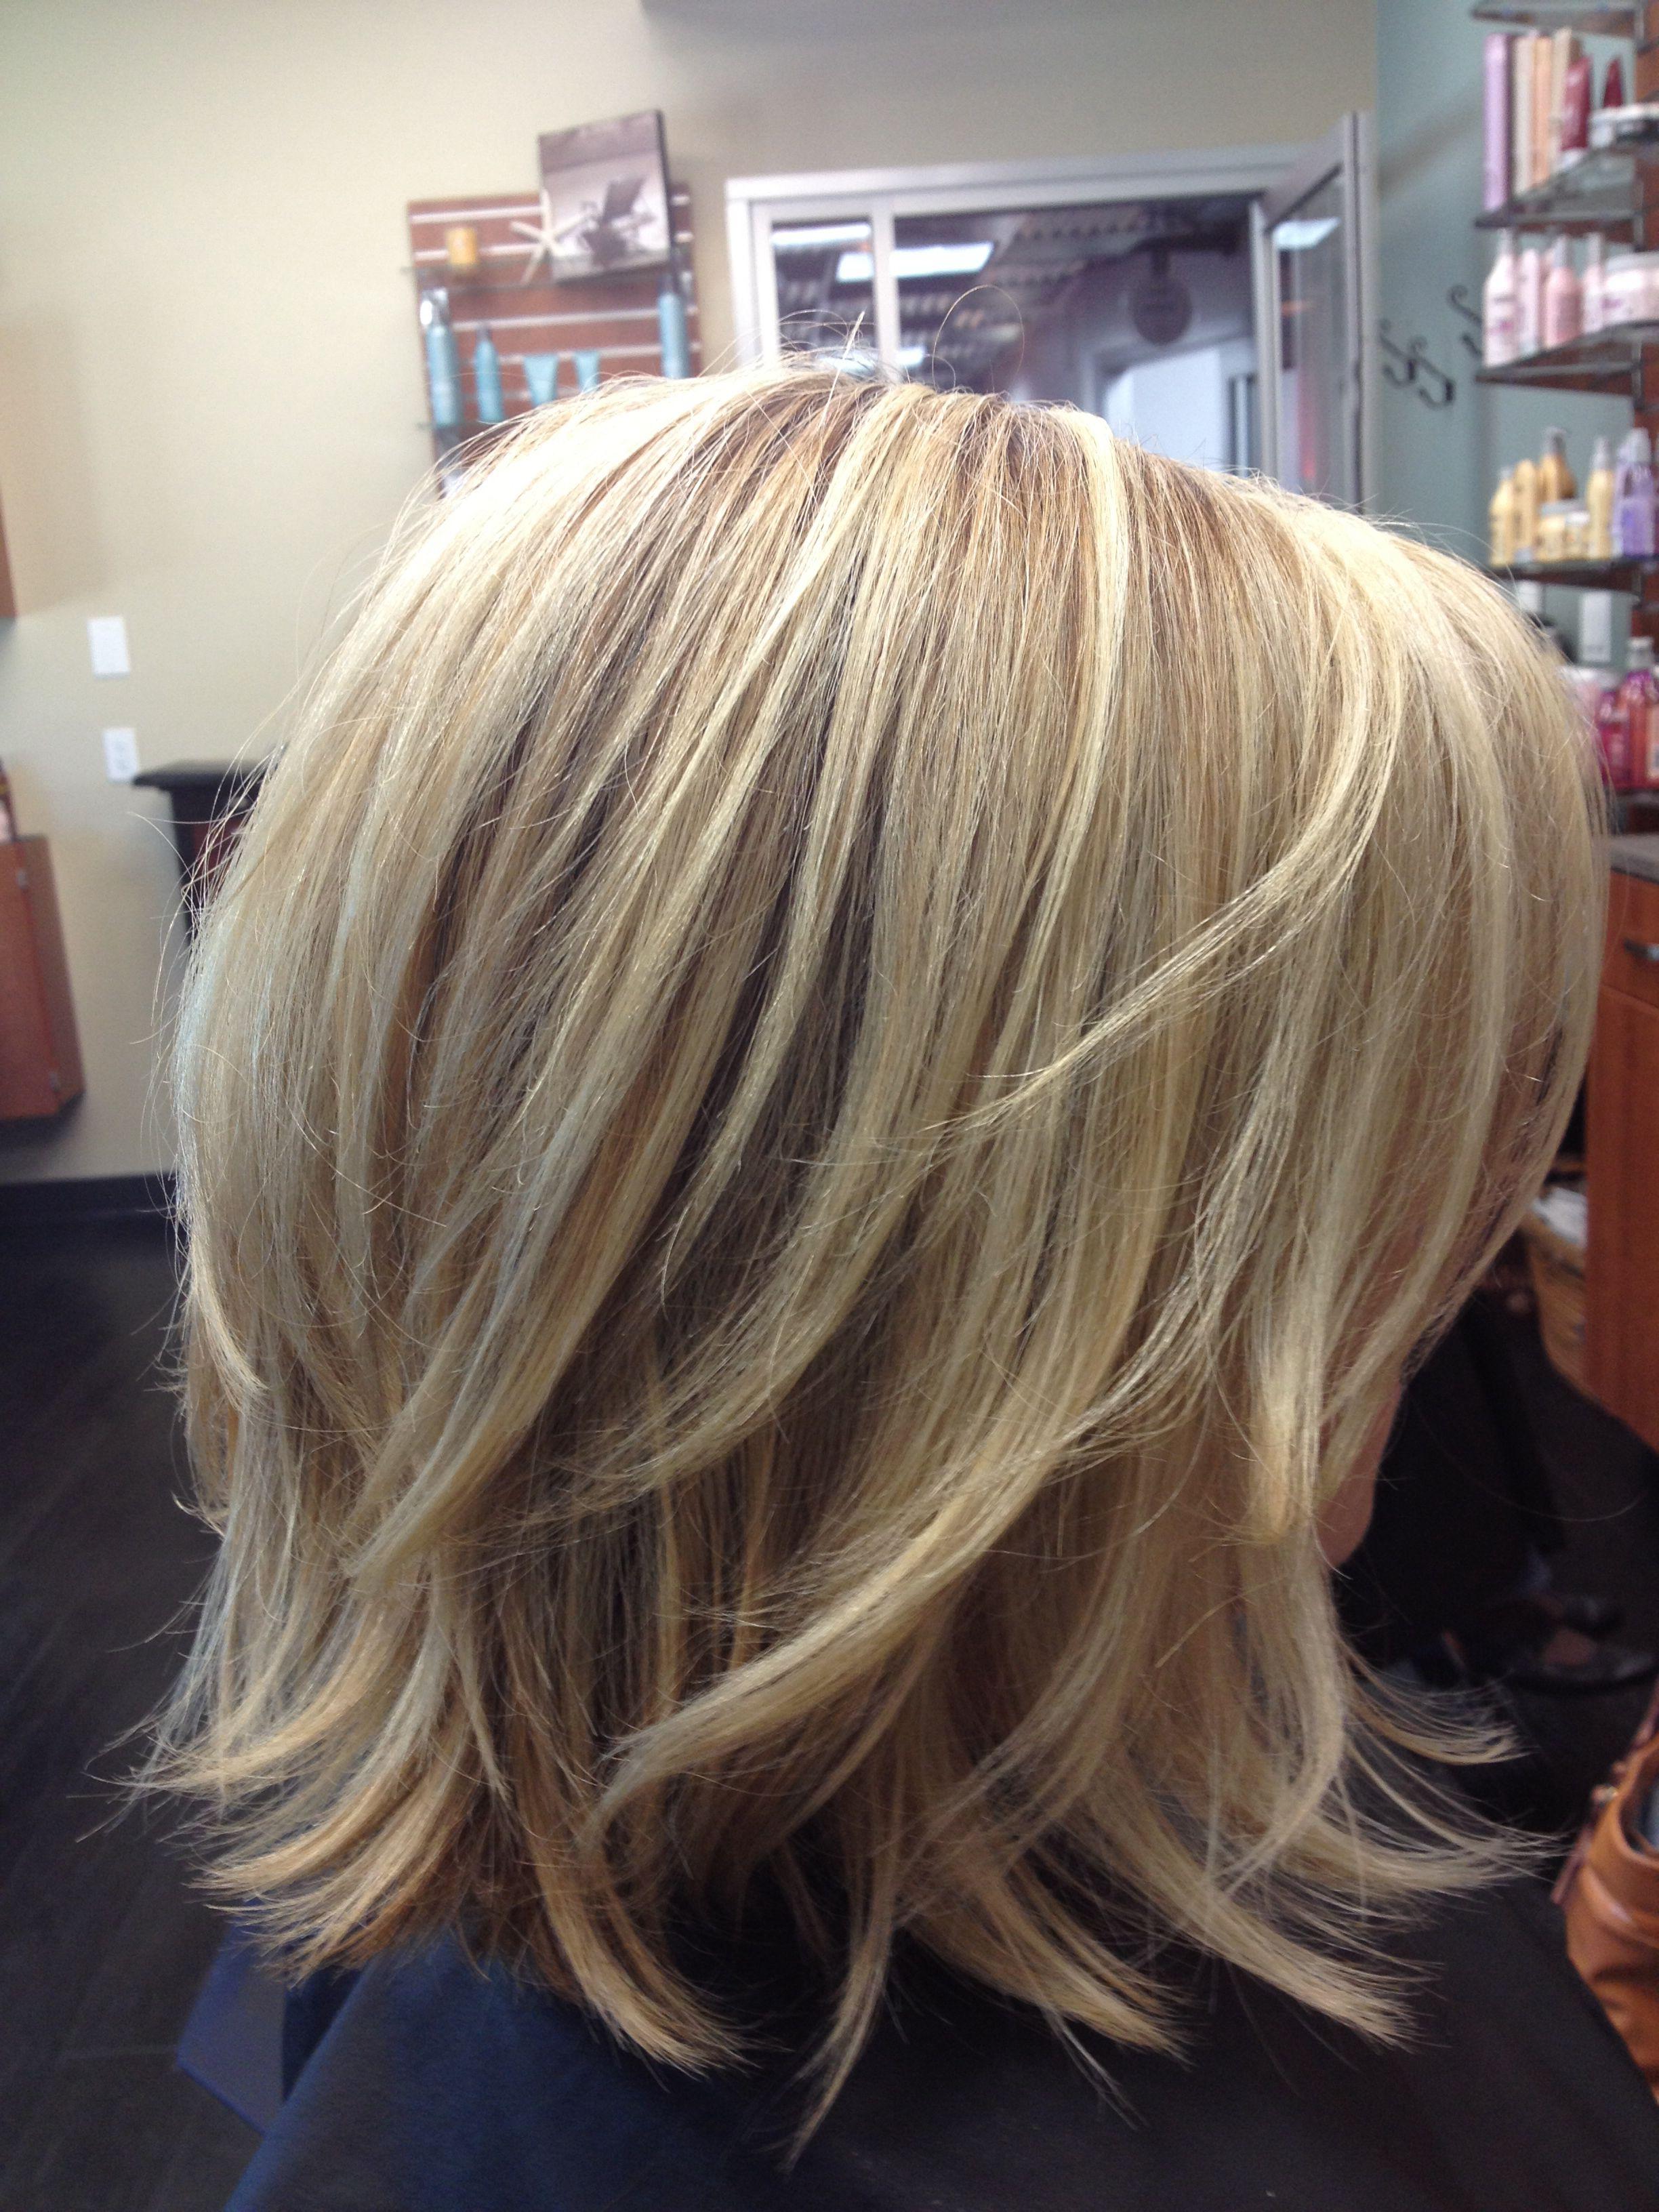 14 trendy medium layered hairstyles in 2019 | hair | hair